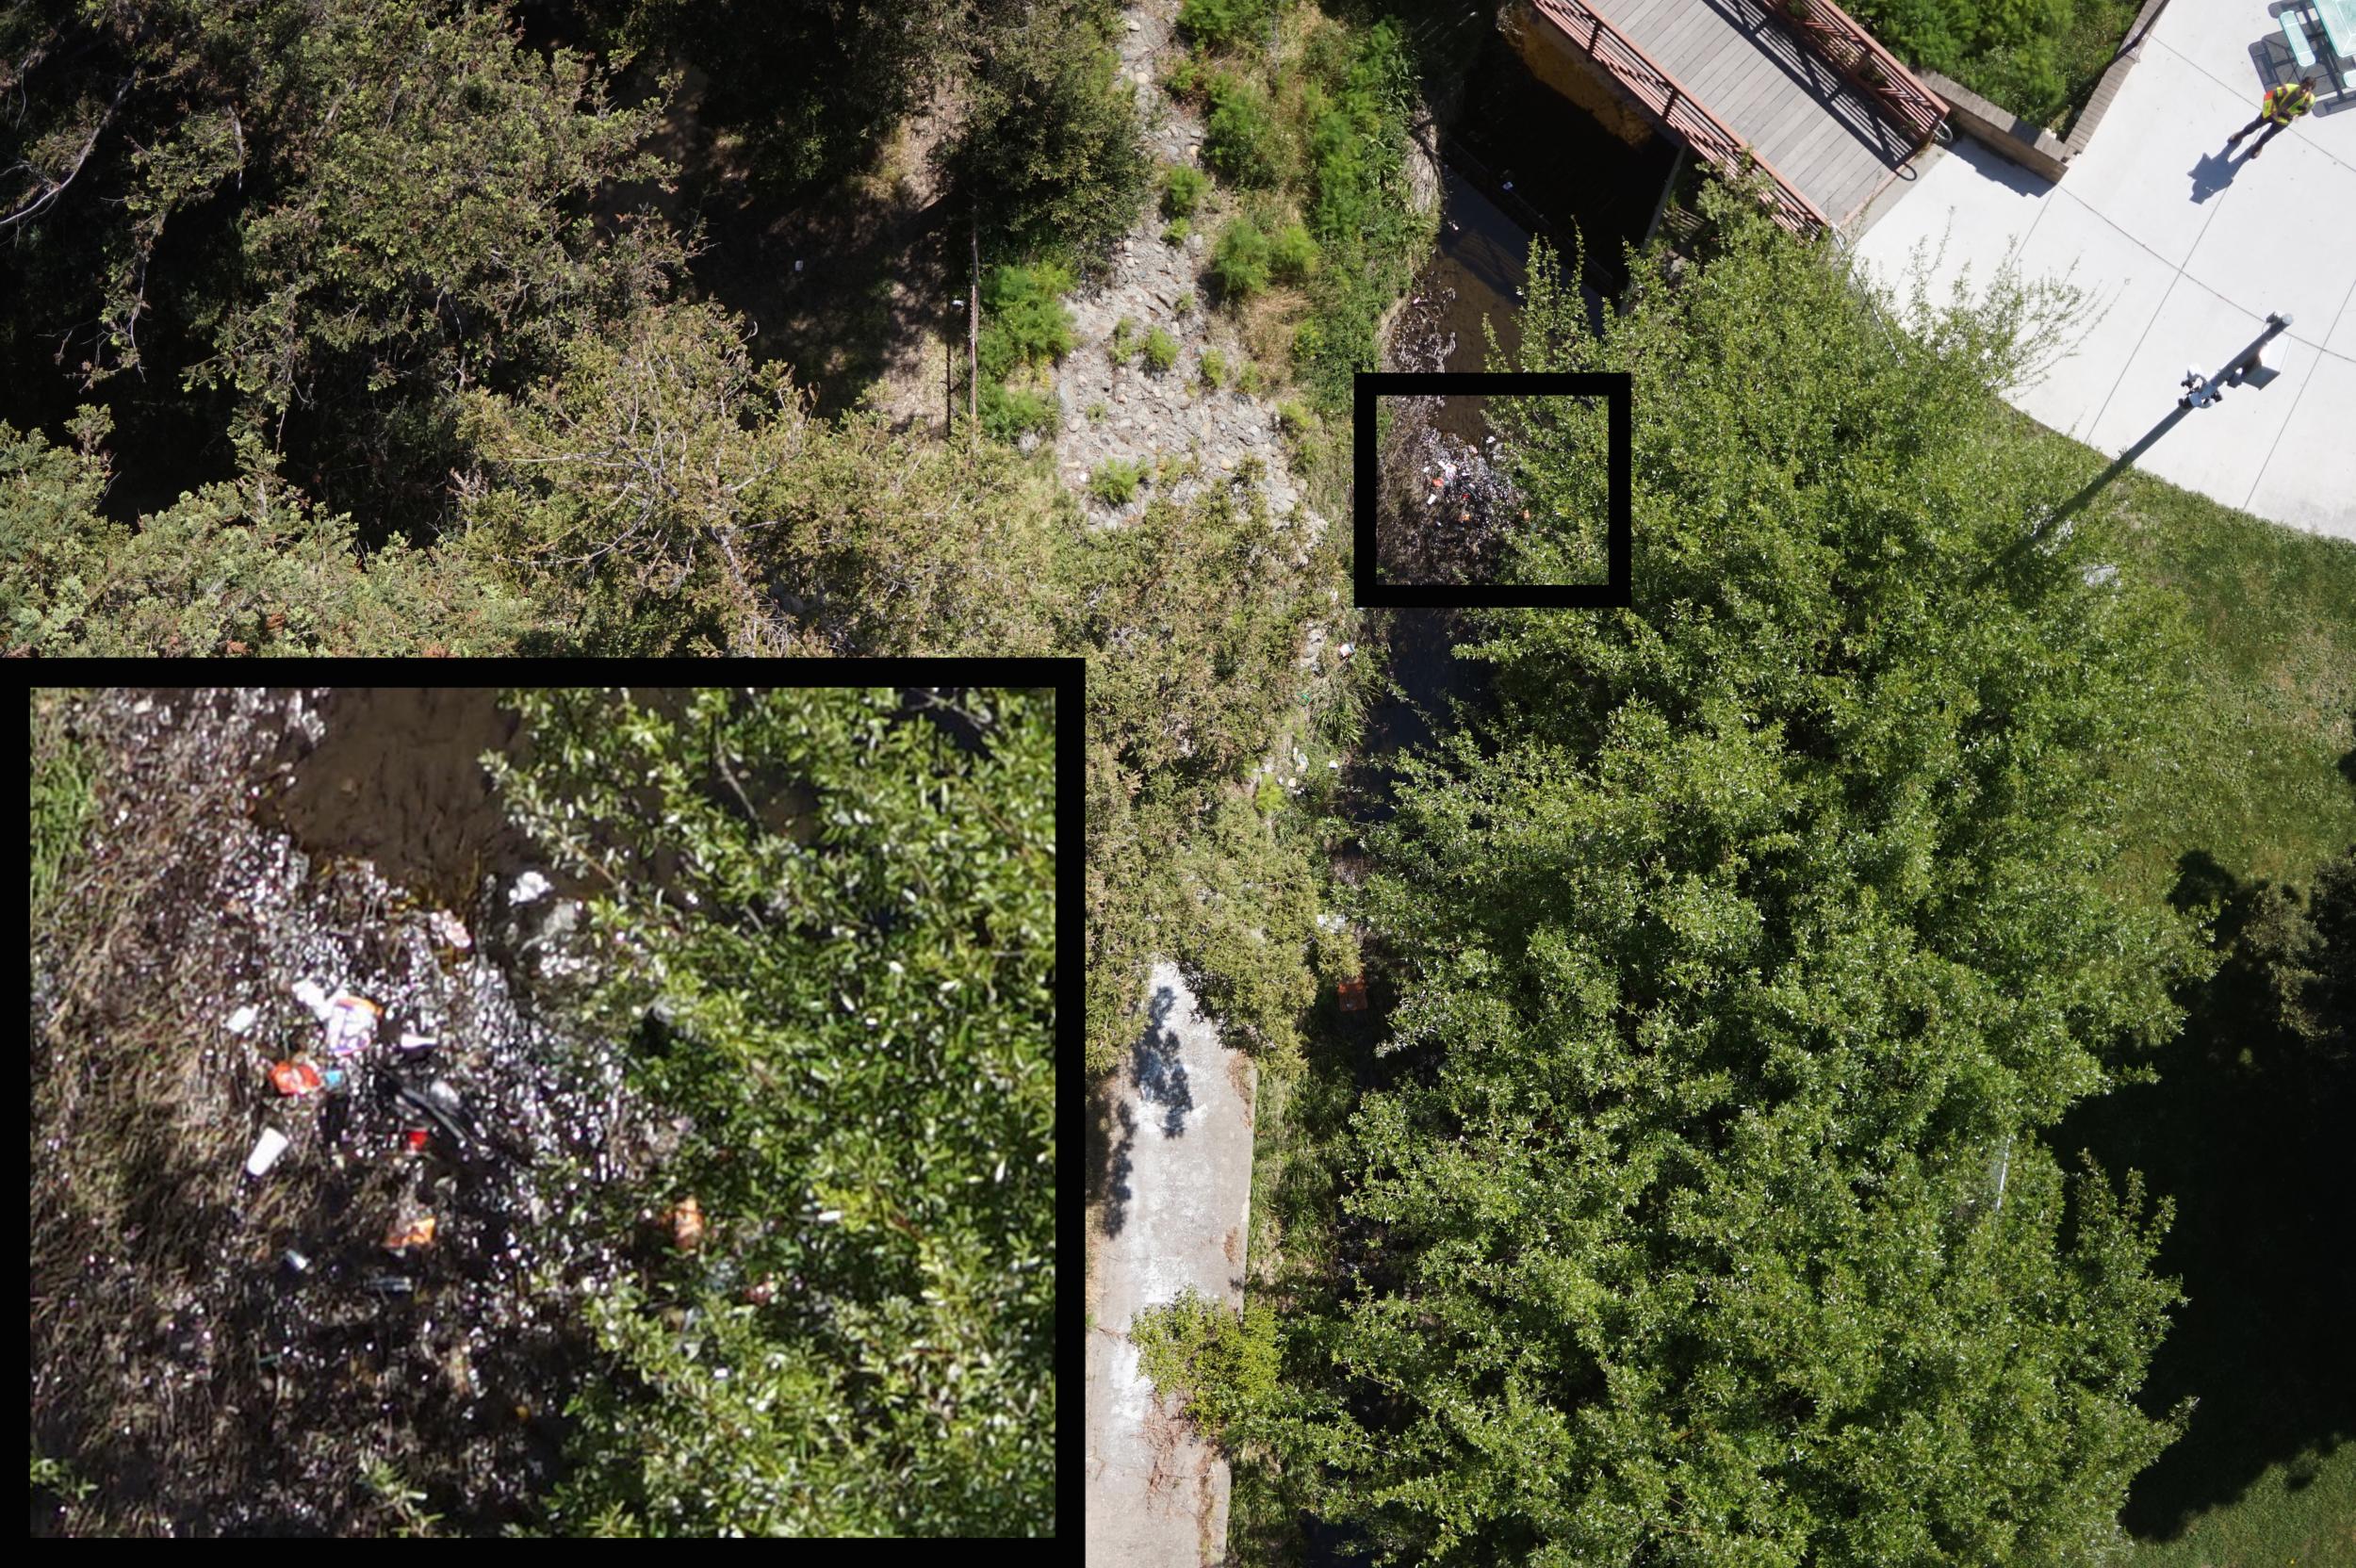 Figure 3. Trash near a bridge in Herbert Park in San Pablo, CA, May 1, 2018